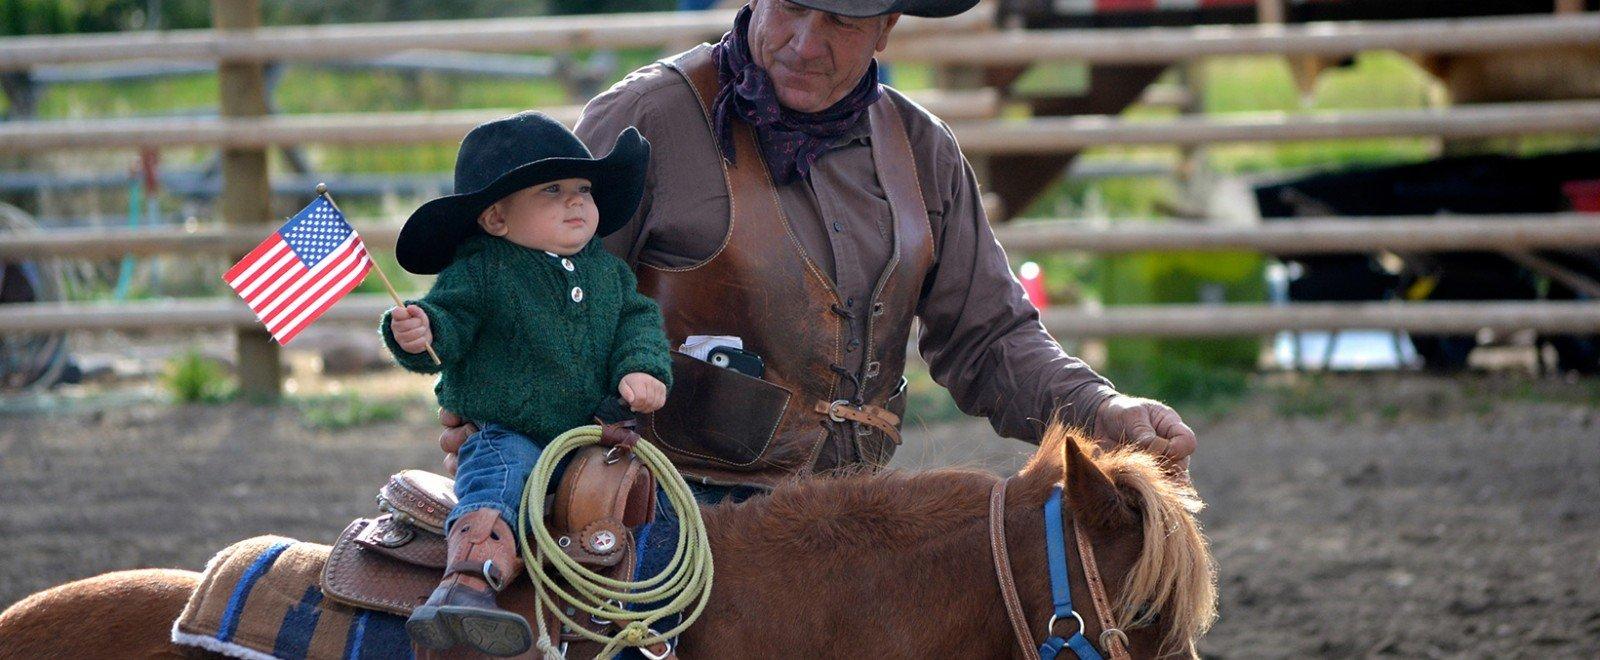 Family Gatherings Amp Award Winning Family Ranch Activities